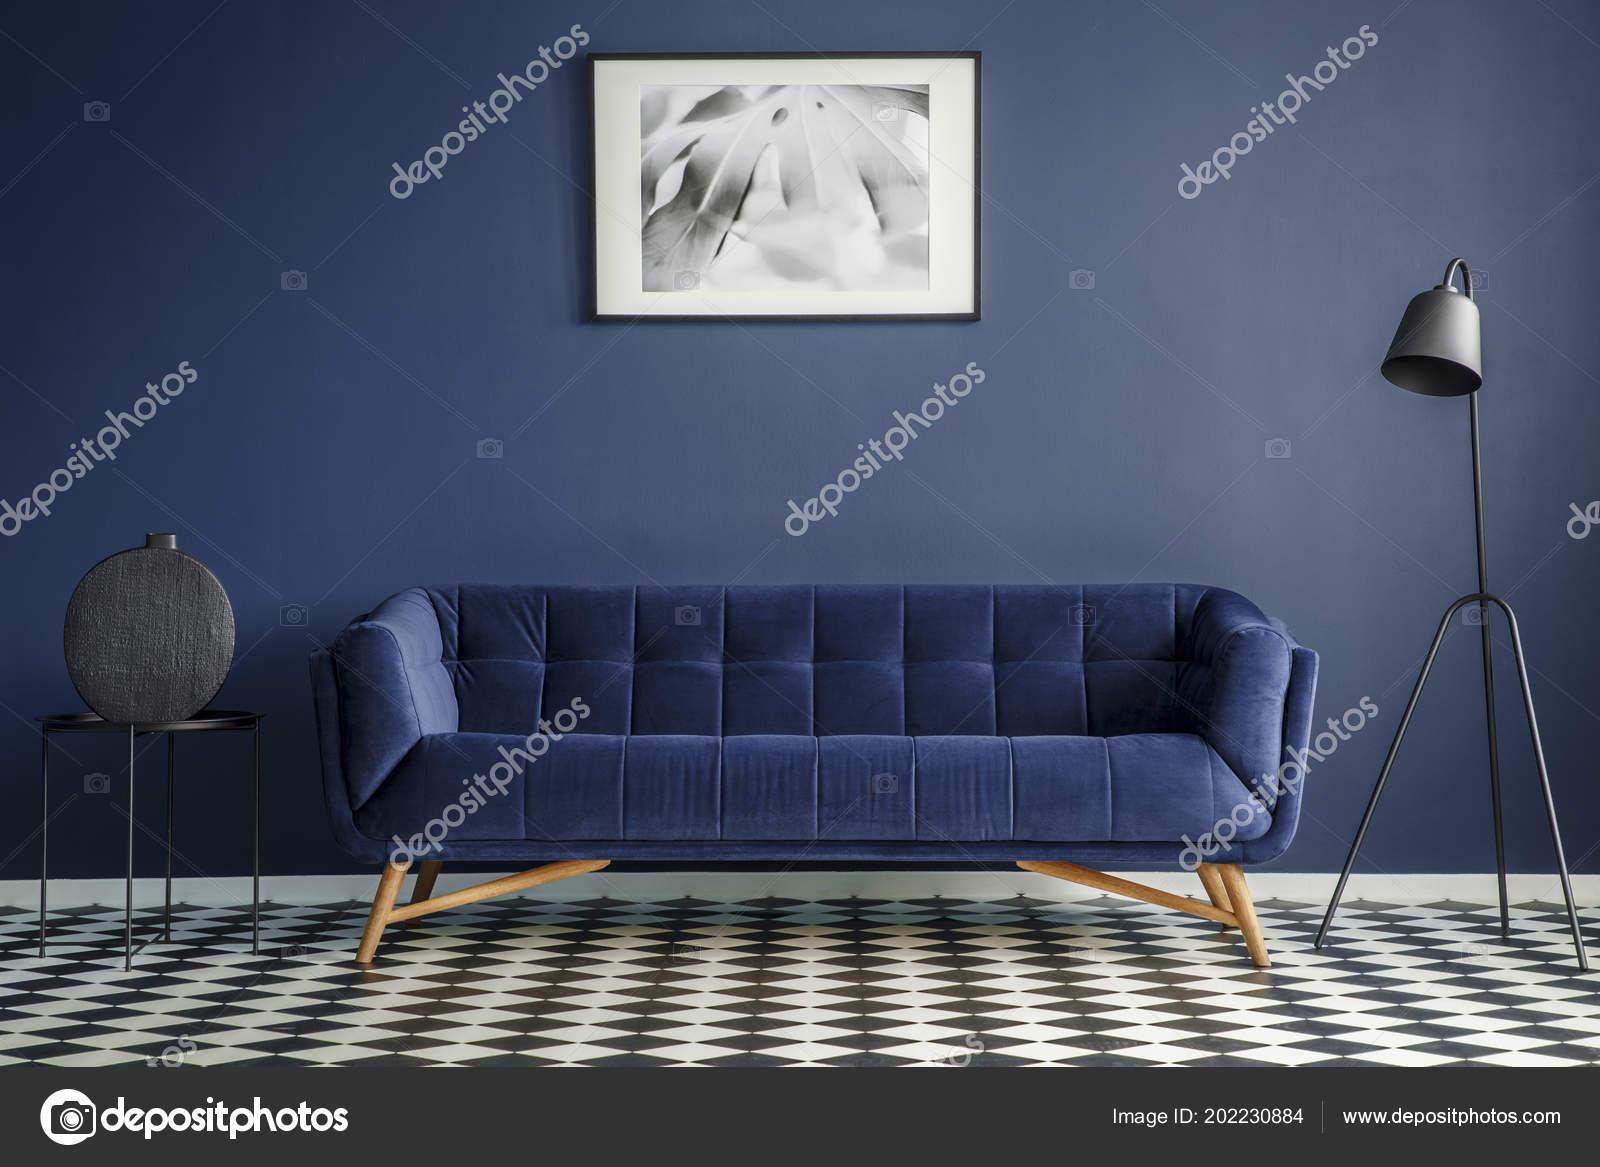 29ae6bc619 Εσωτερικό Ναυτικό Μπλε Δωμάτιο Άνετο Καναπέ Βελούδου Στη Μέση Μαύρο– εικόνα  αρχείου